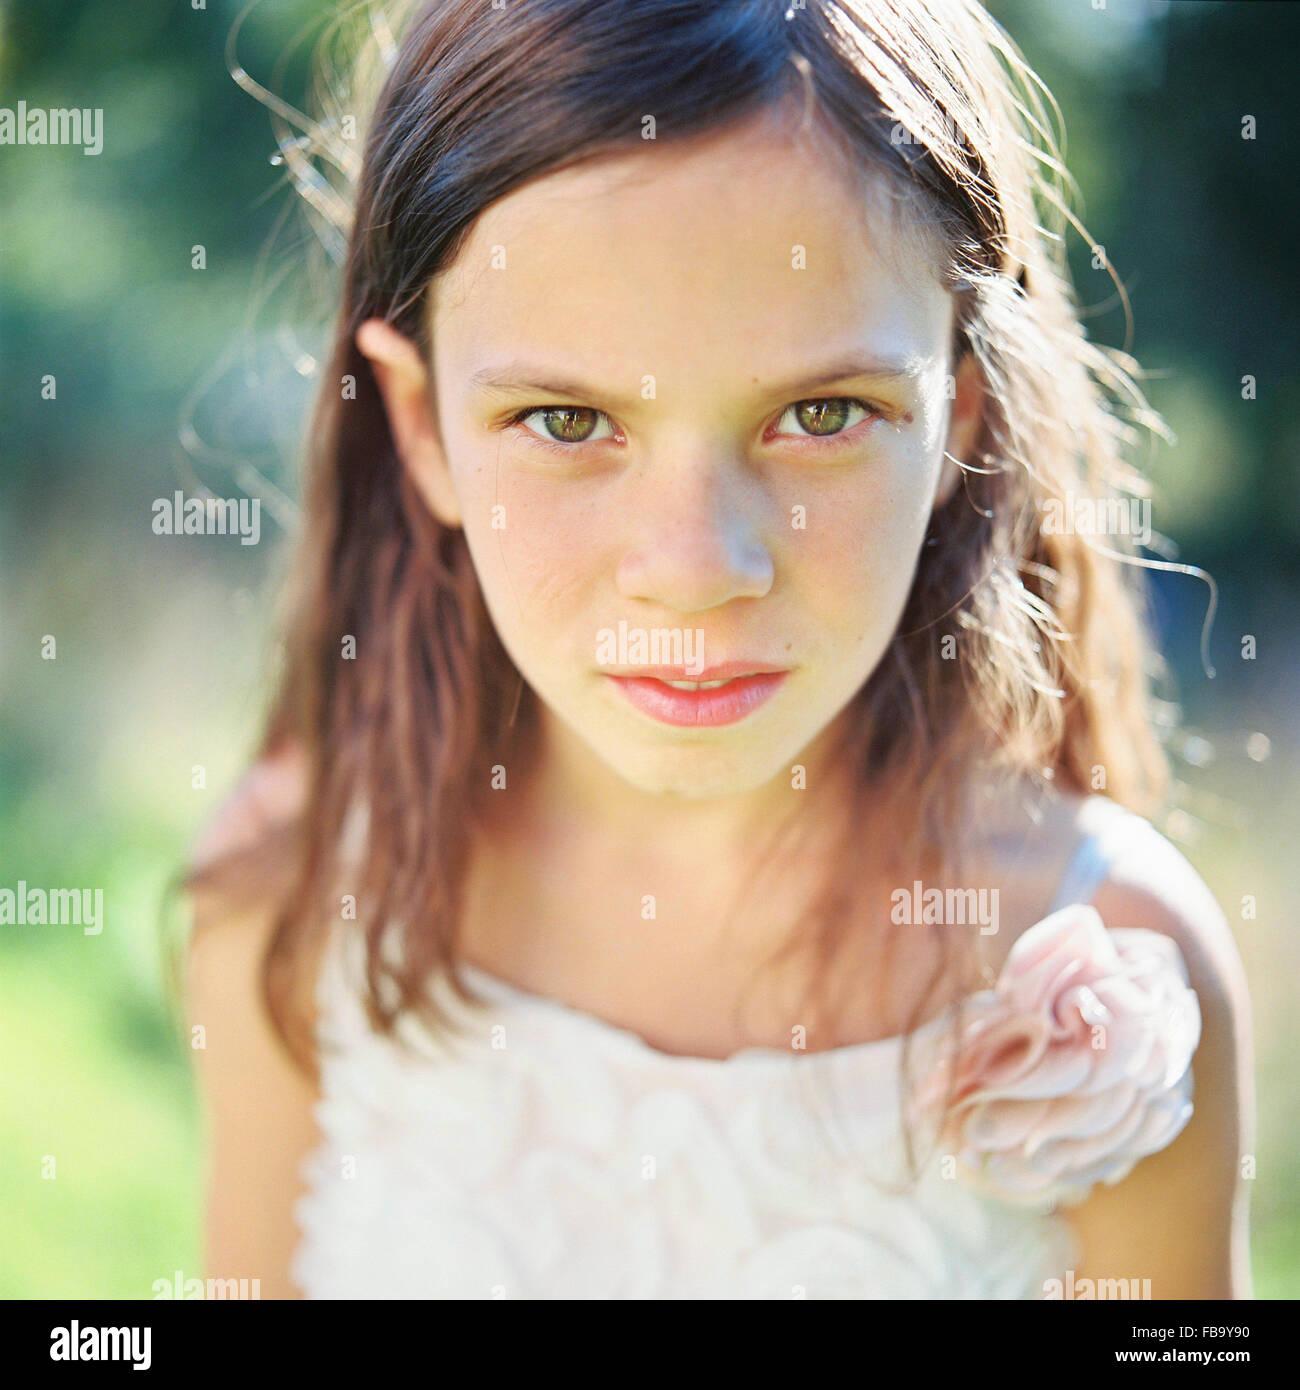 Schweden, Vastmanland, Mädchen (6-7) Blick in die Kamera Stockbild